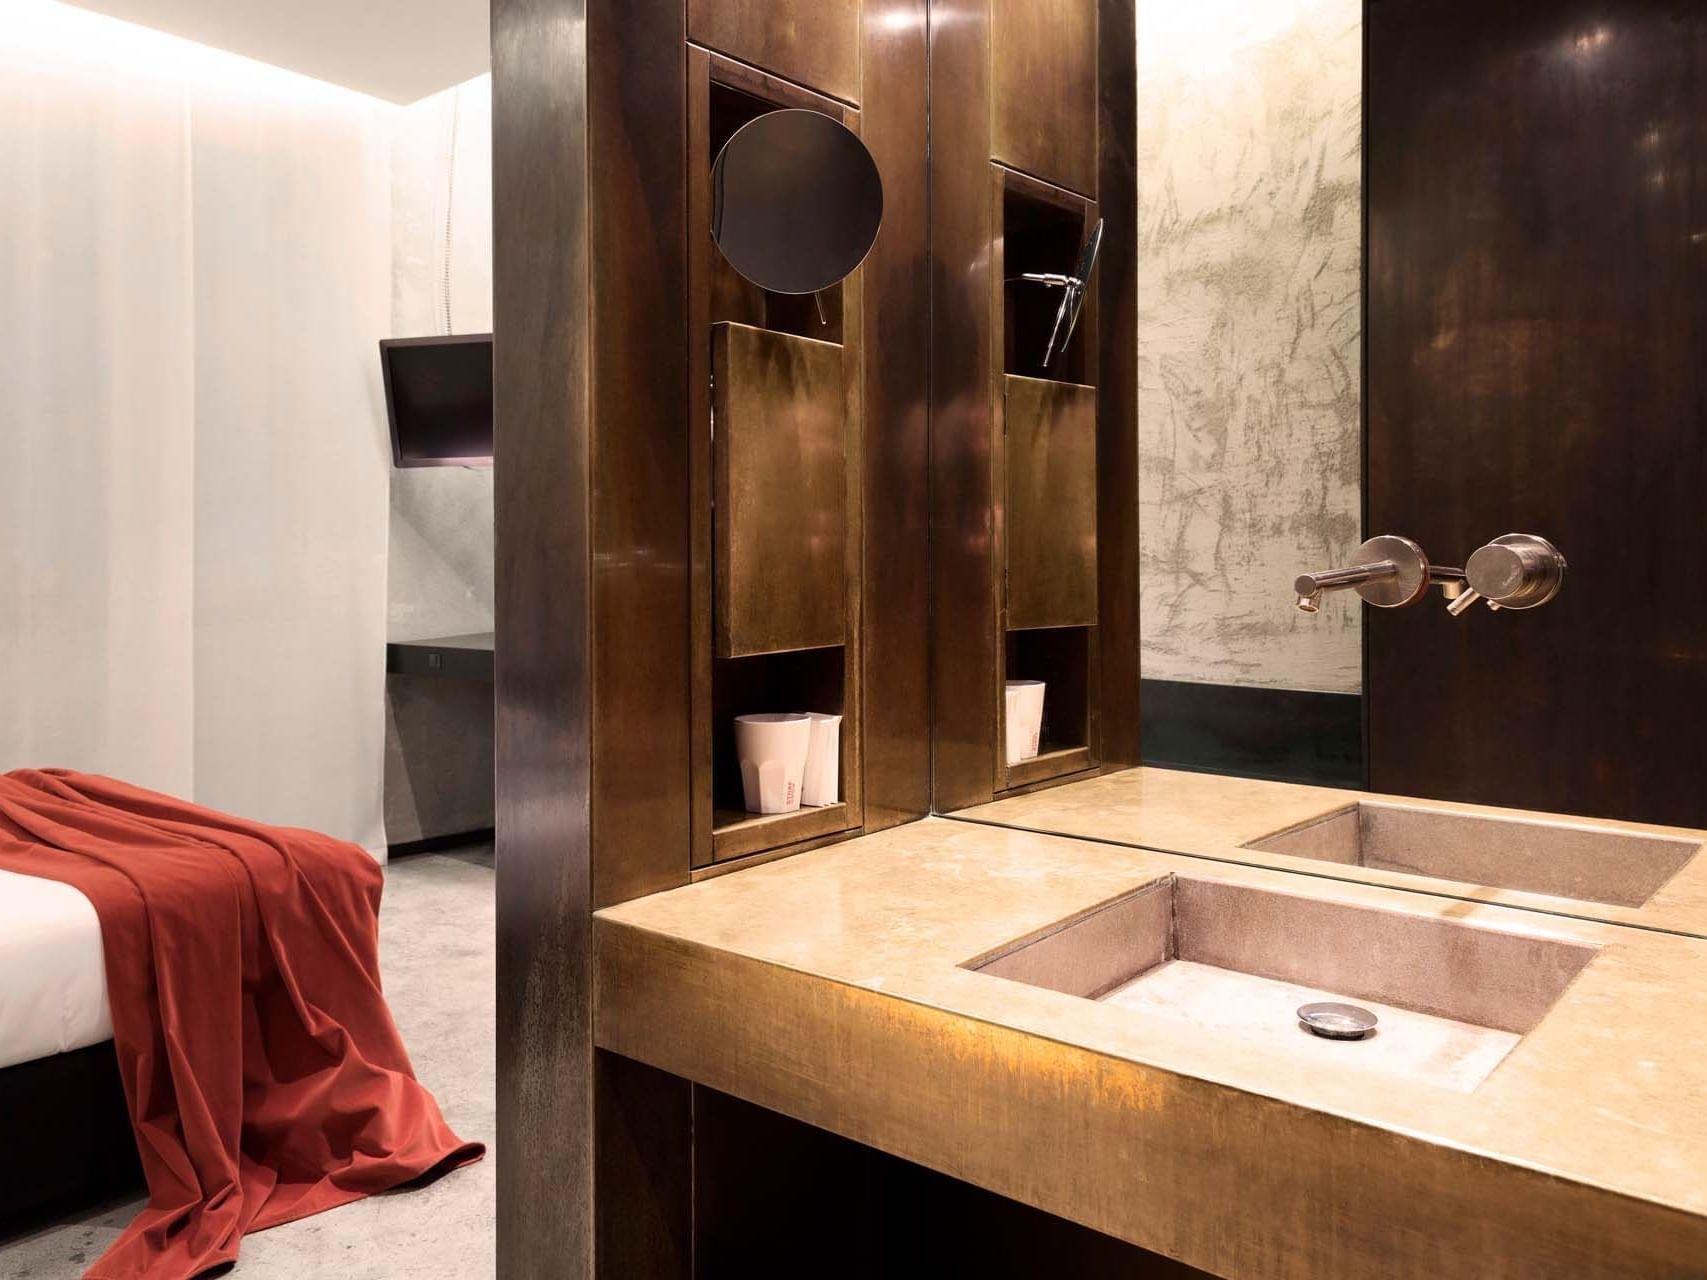 Single Room at STRAFhotel&bar in Milan centre